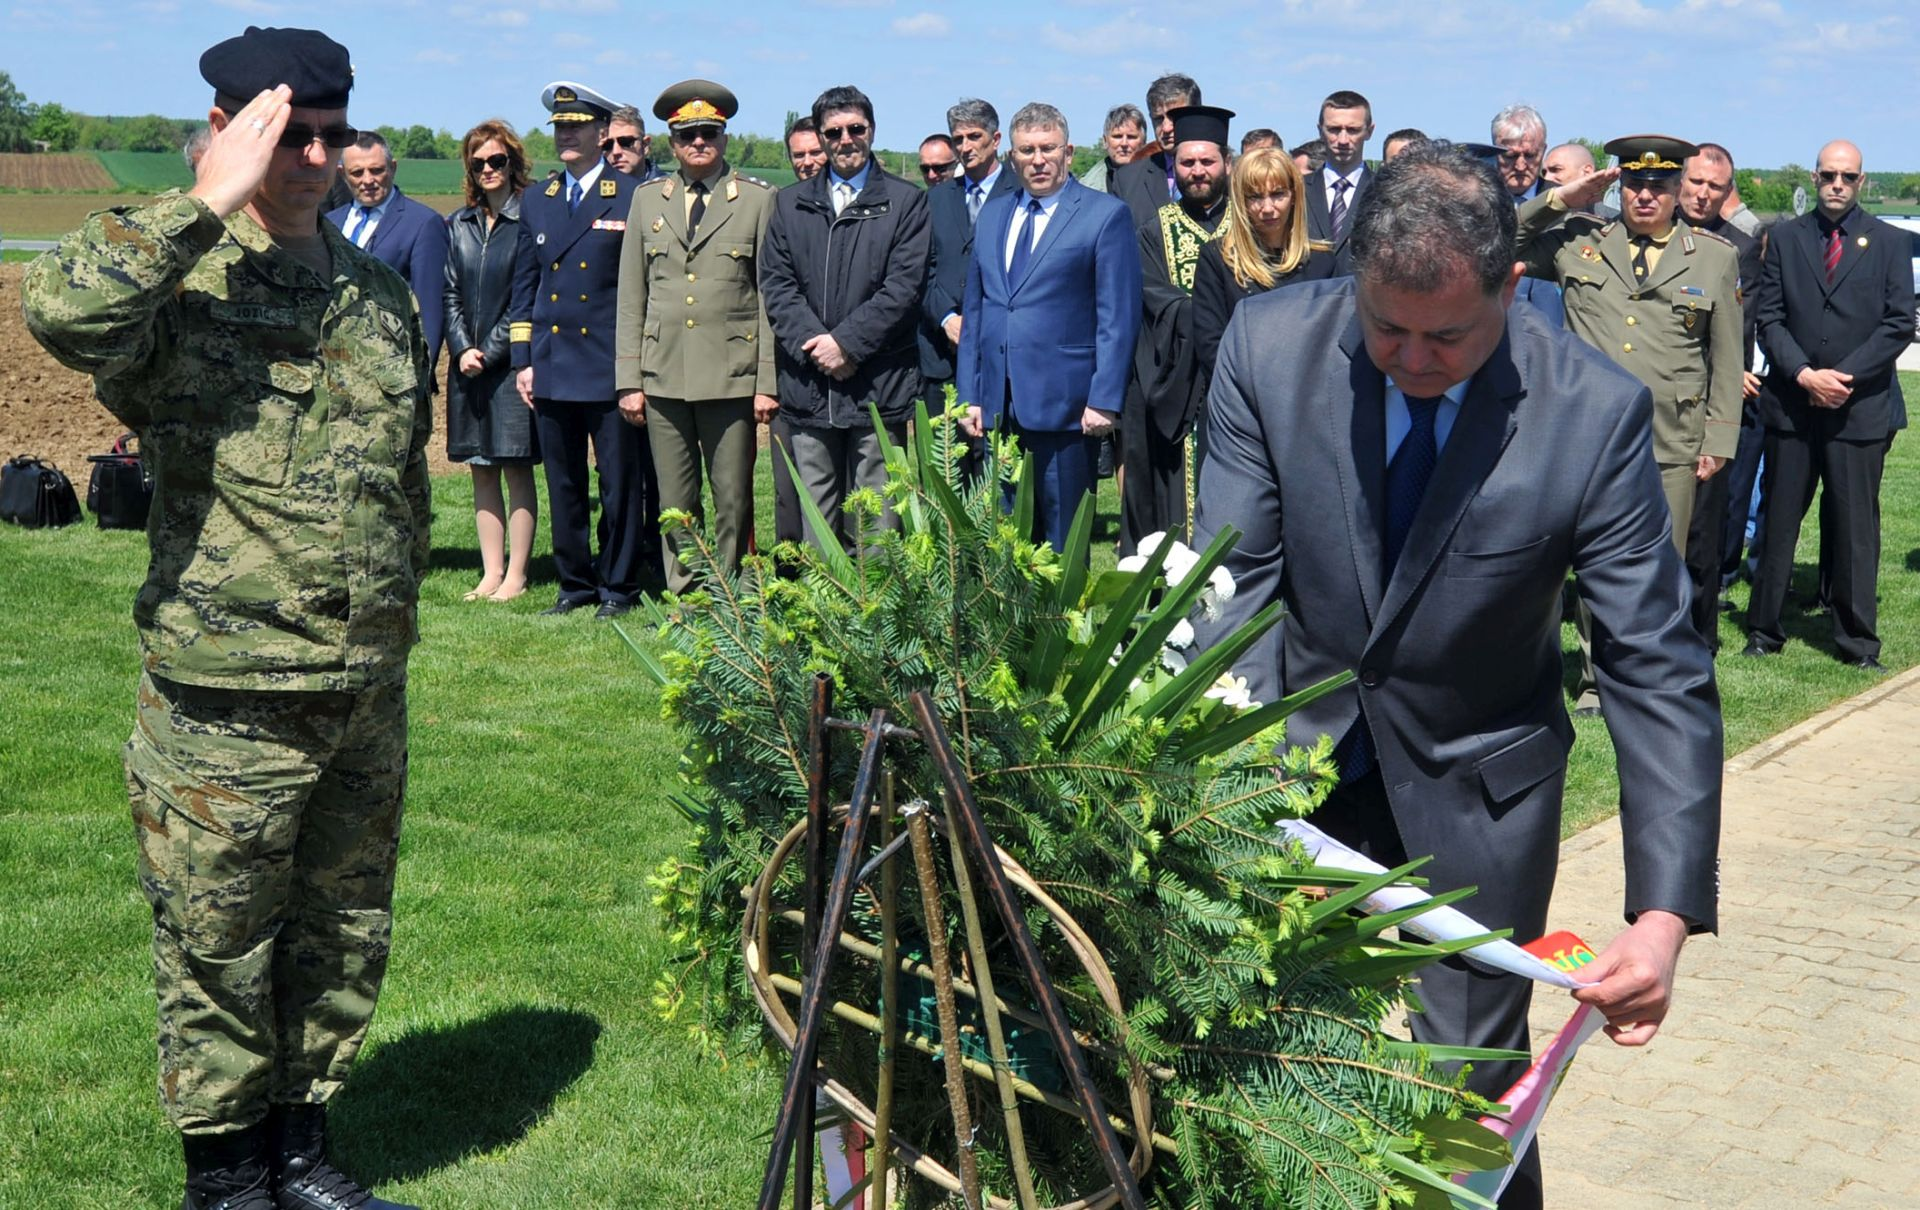 OBNOVLJENA SPOMEN-KOSTURNICA: Ministar obrane Nenchev na bugarskome vojnom groblju u Vukovaru